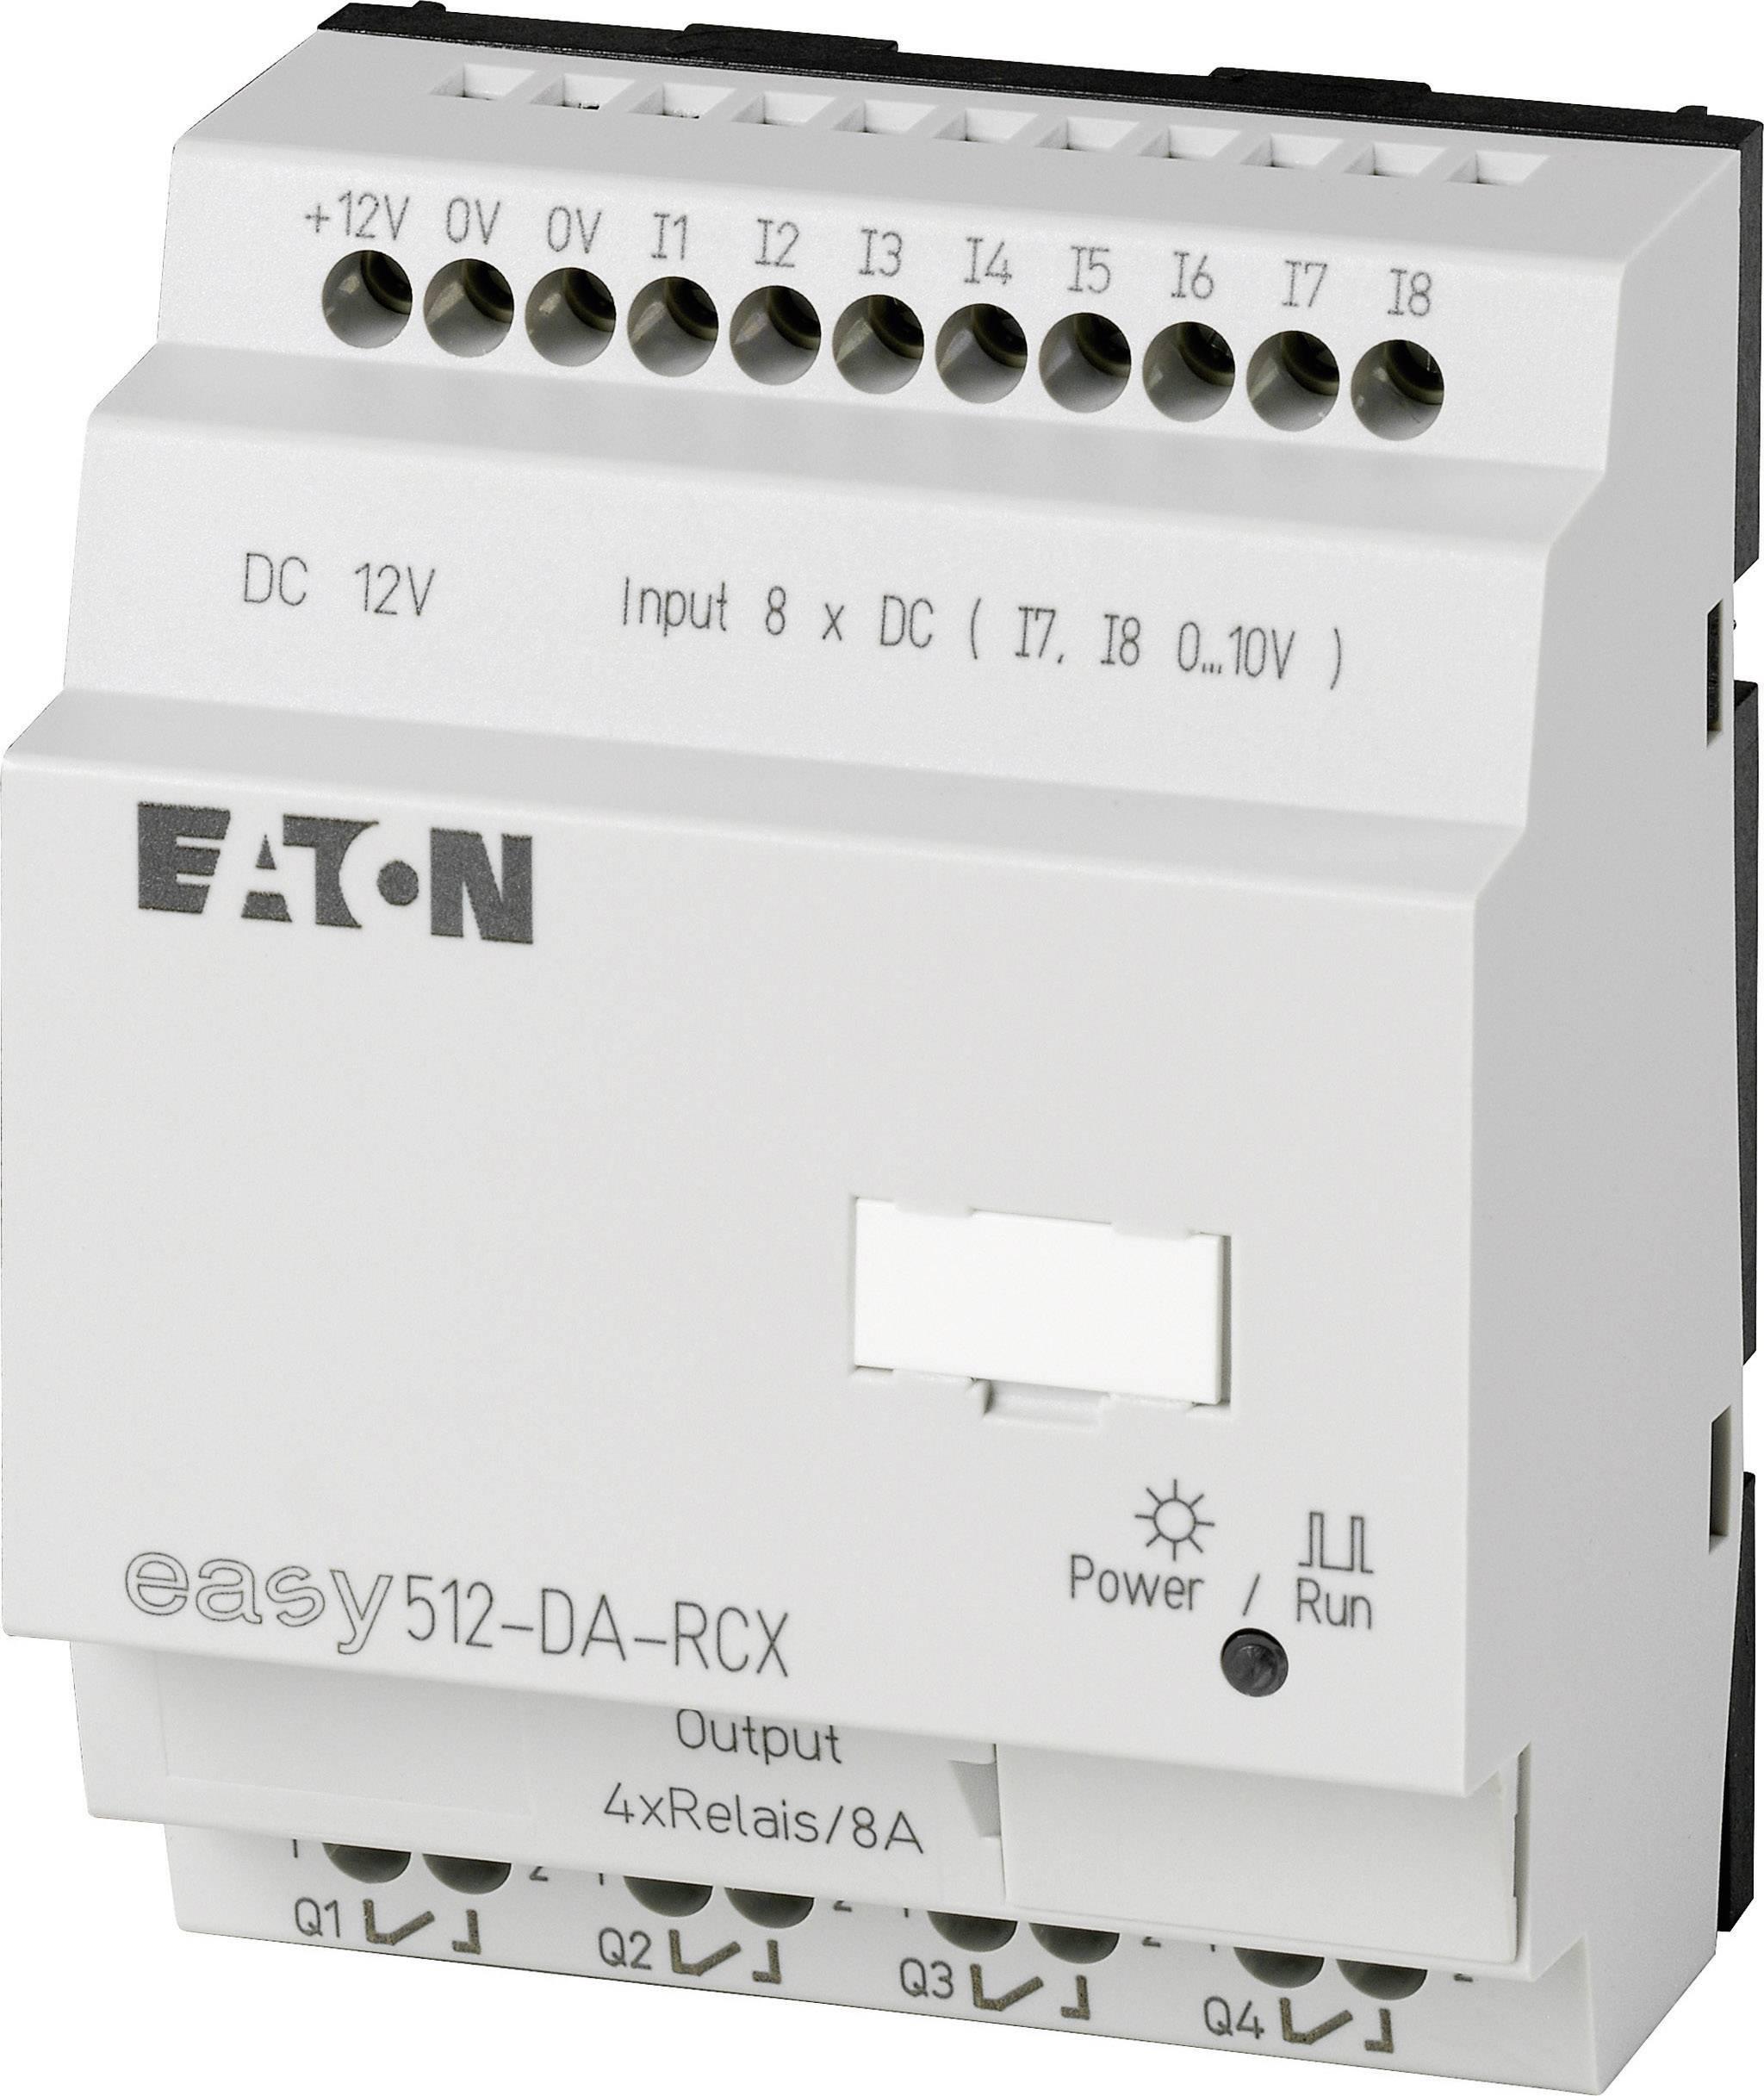 Riadiacimodul Eaton easy 512-DA-RCX 274107, 12 V/DC